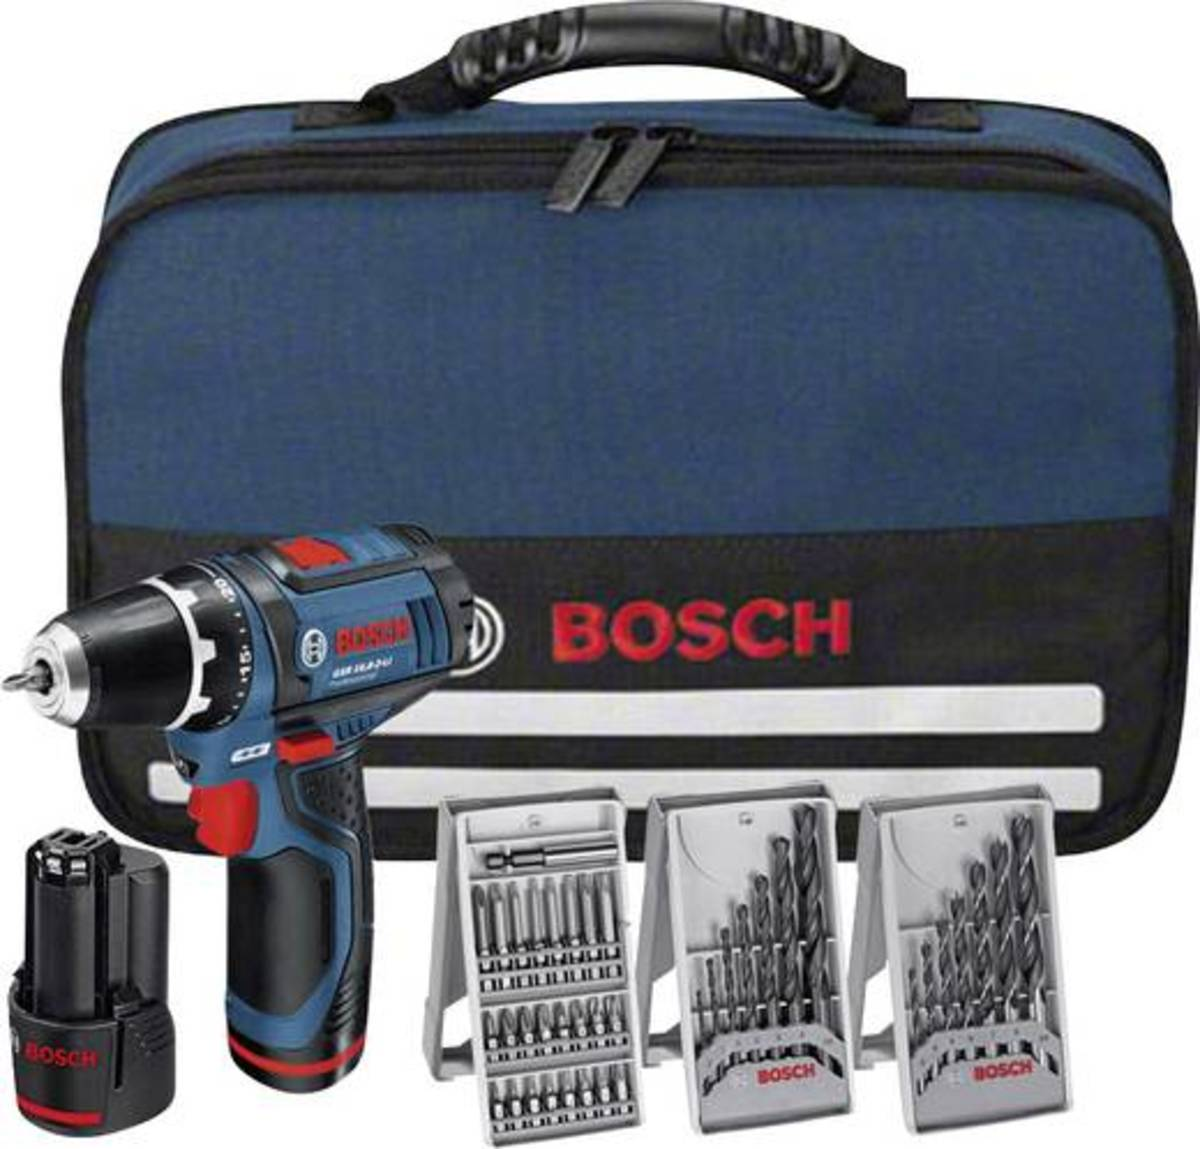 Bild 1 von Bosch Professional GSR12V-15 Akku-Bohrschrauber 12 V 1.5 Ah Li-Ion inkl. 2. Akku, inkl. Zubehör, inkl. Tasche